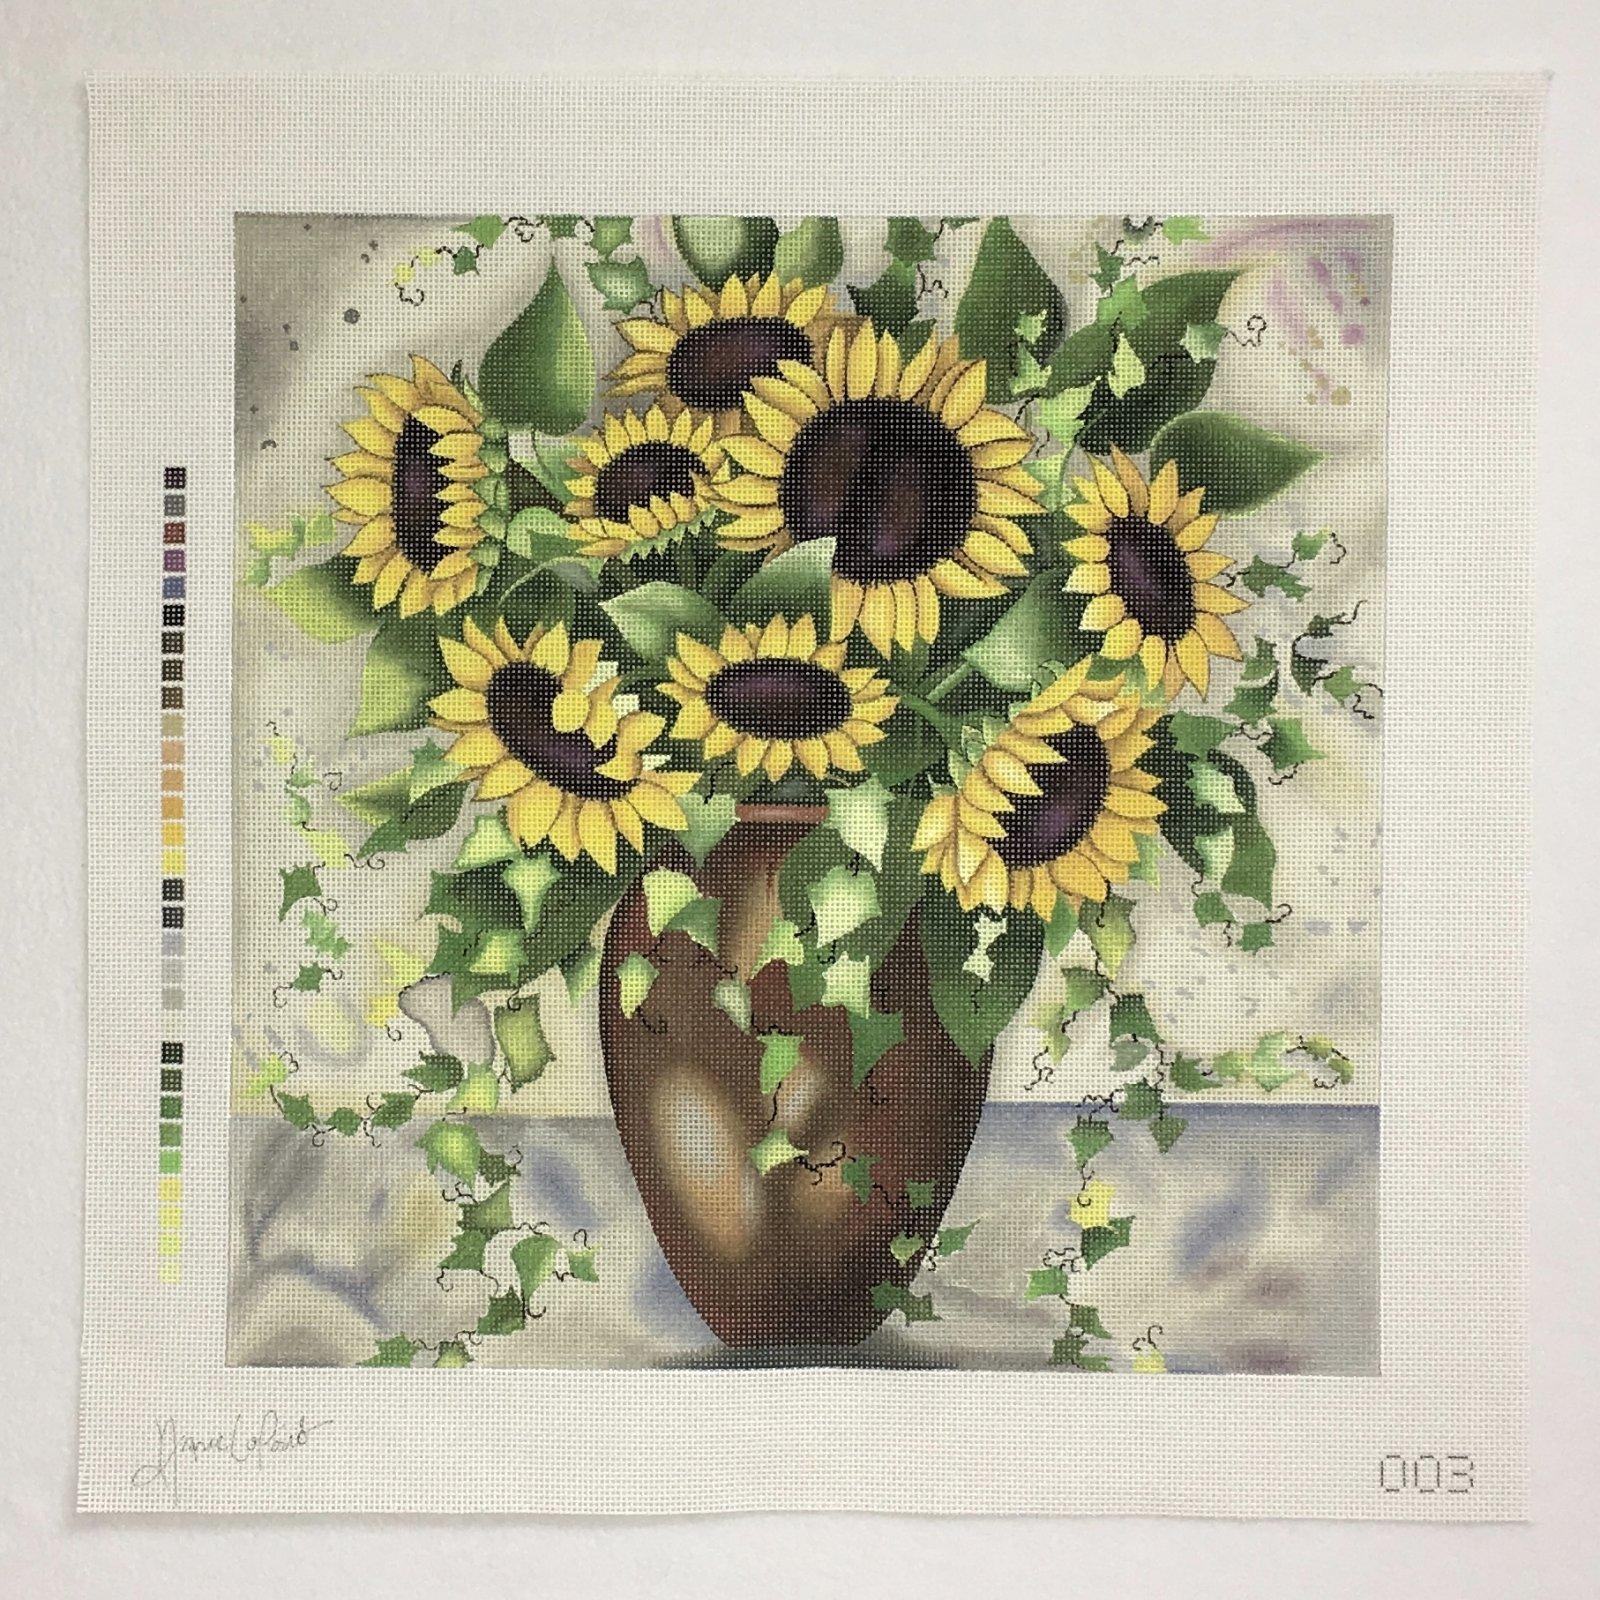 ALP003 Sunflowers in Vase